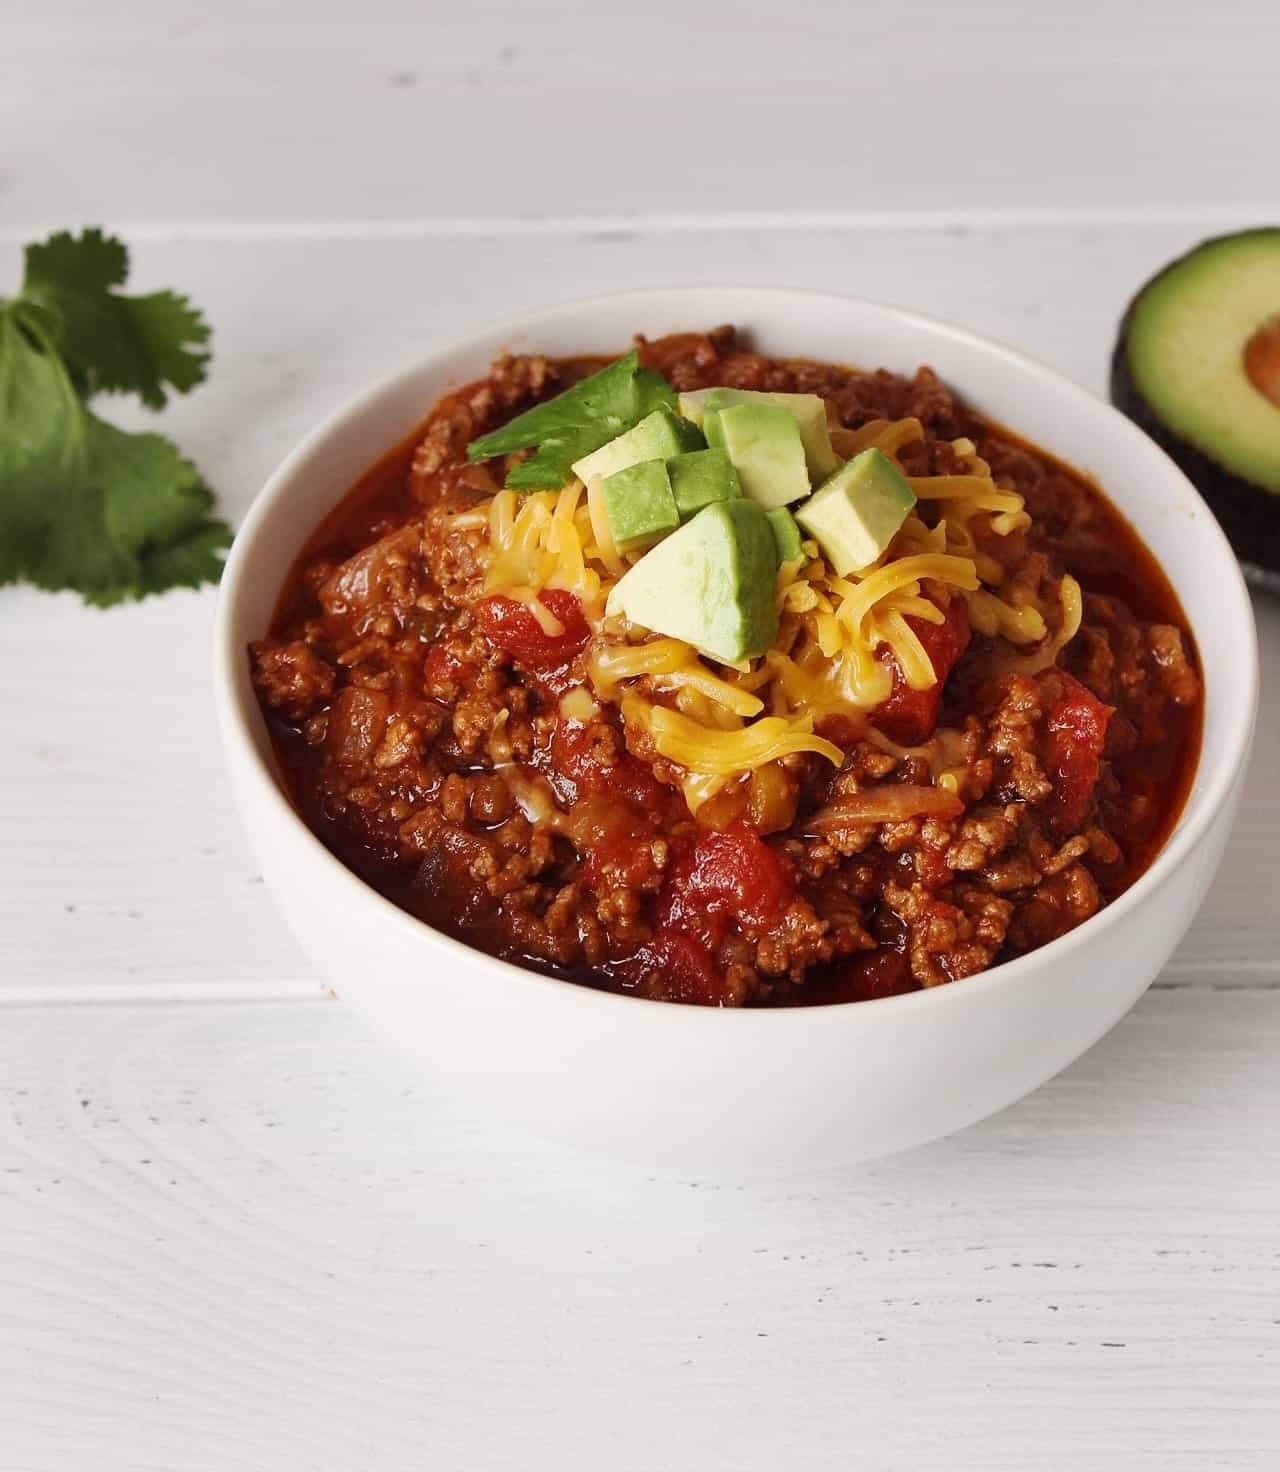 Keto Crockpot Chili -Low Carb Beef Chili